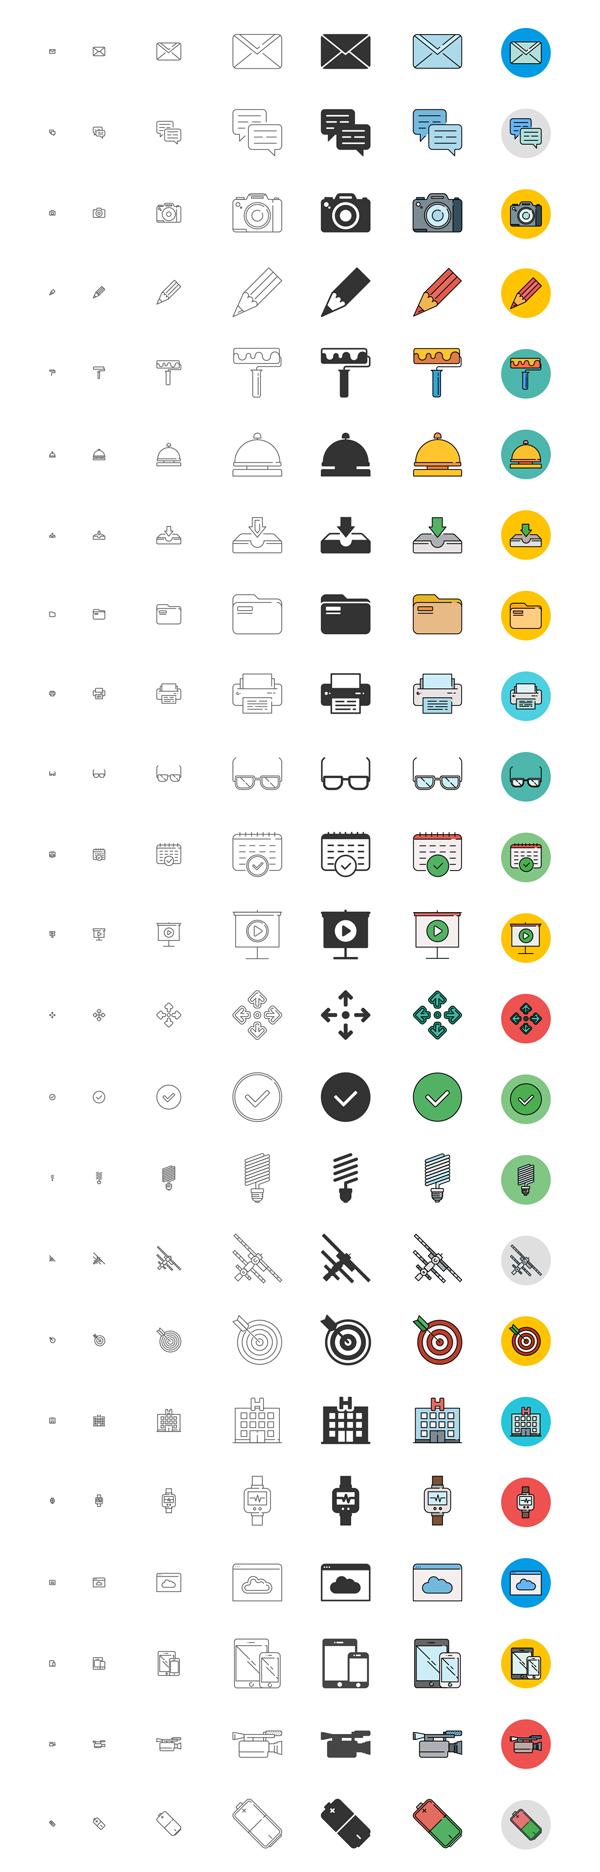 Free Responsive Icons Set - 192 Icons